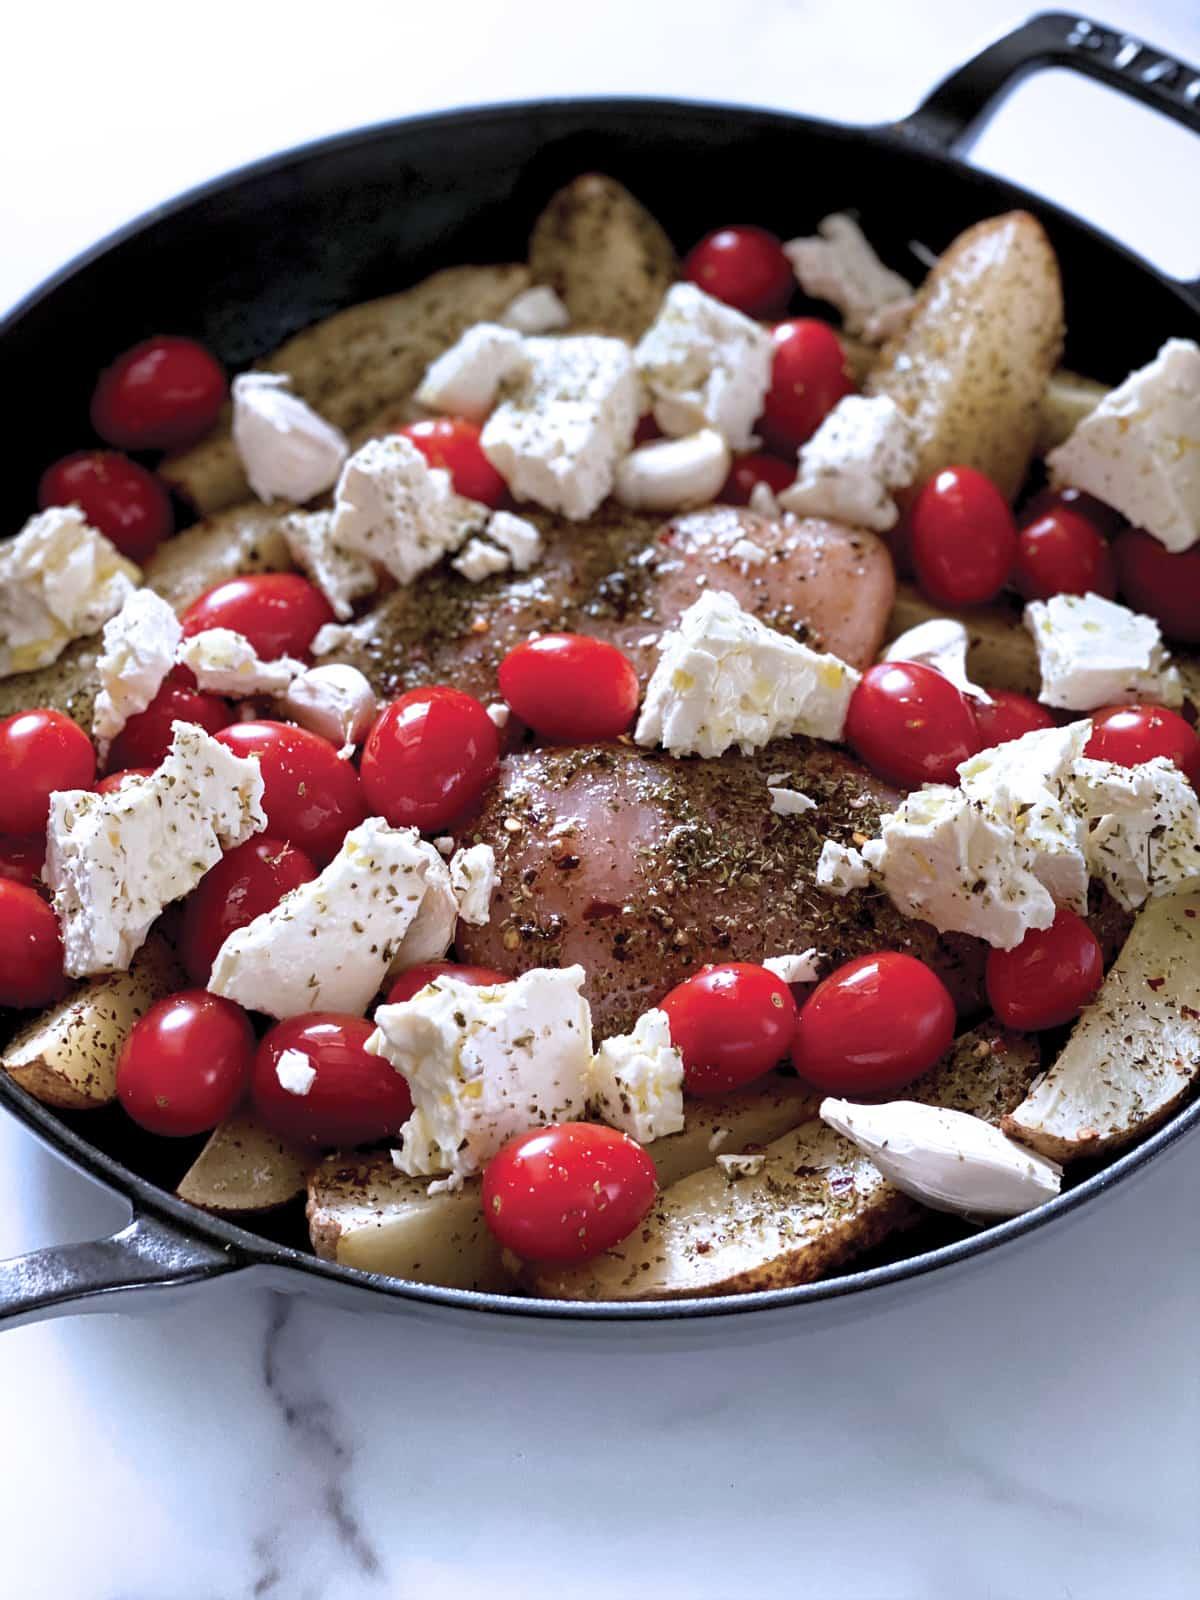 Chicken breast, cherry tomatoes, garlic cloves, potato wedges in a round black pan.